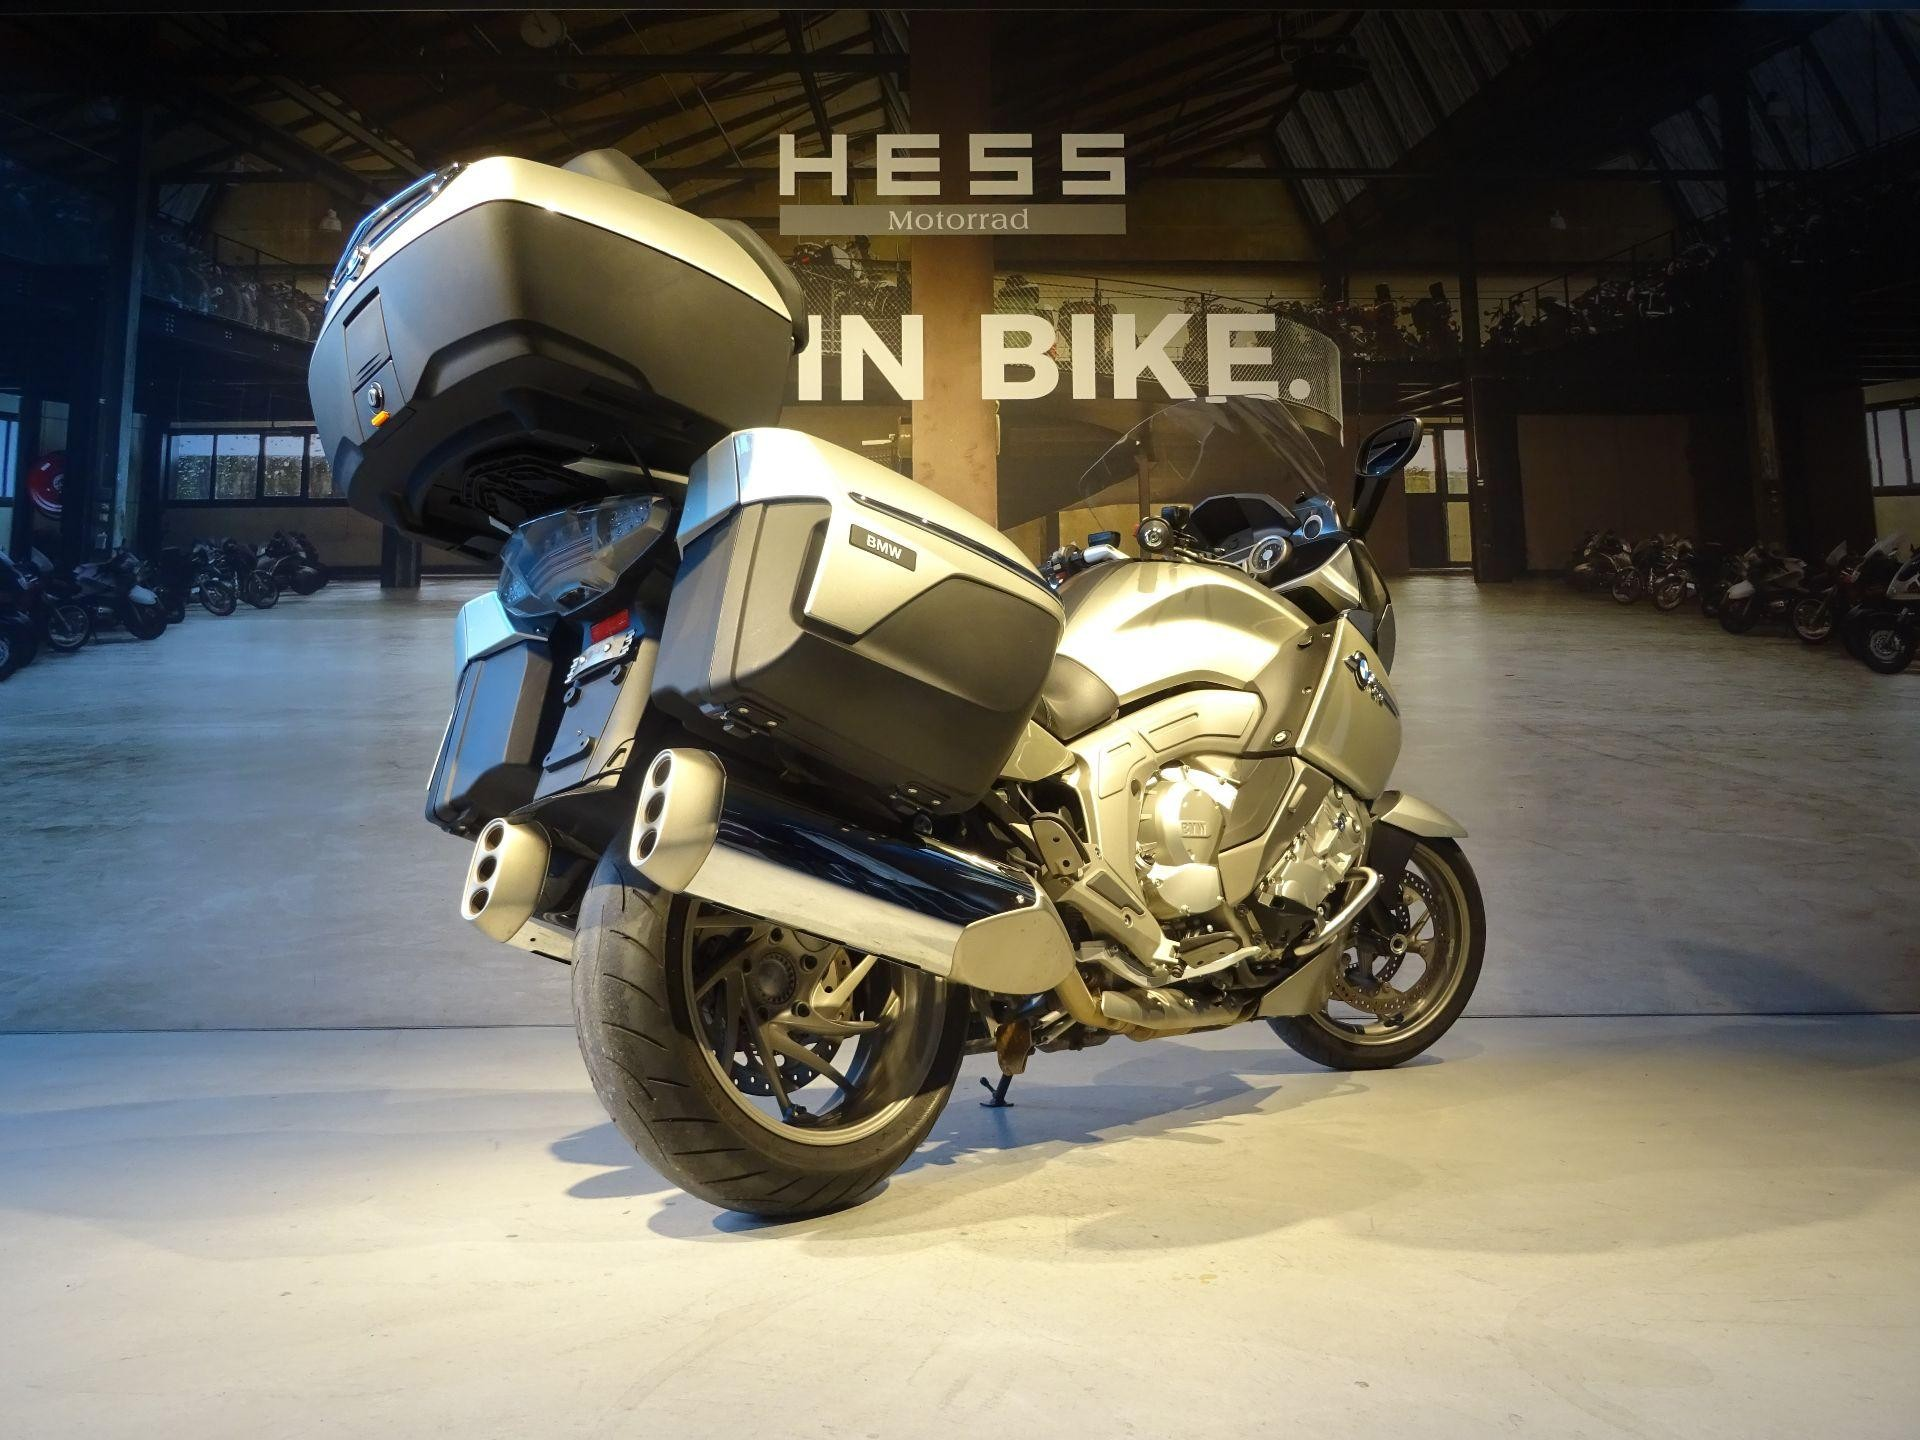 moto occasions acheter bmw k 1600 gtl abs hess motorrad stettlen. Black Bedroom Furniture Sets. Home Design Ideas